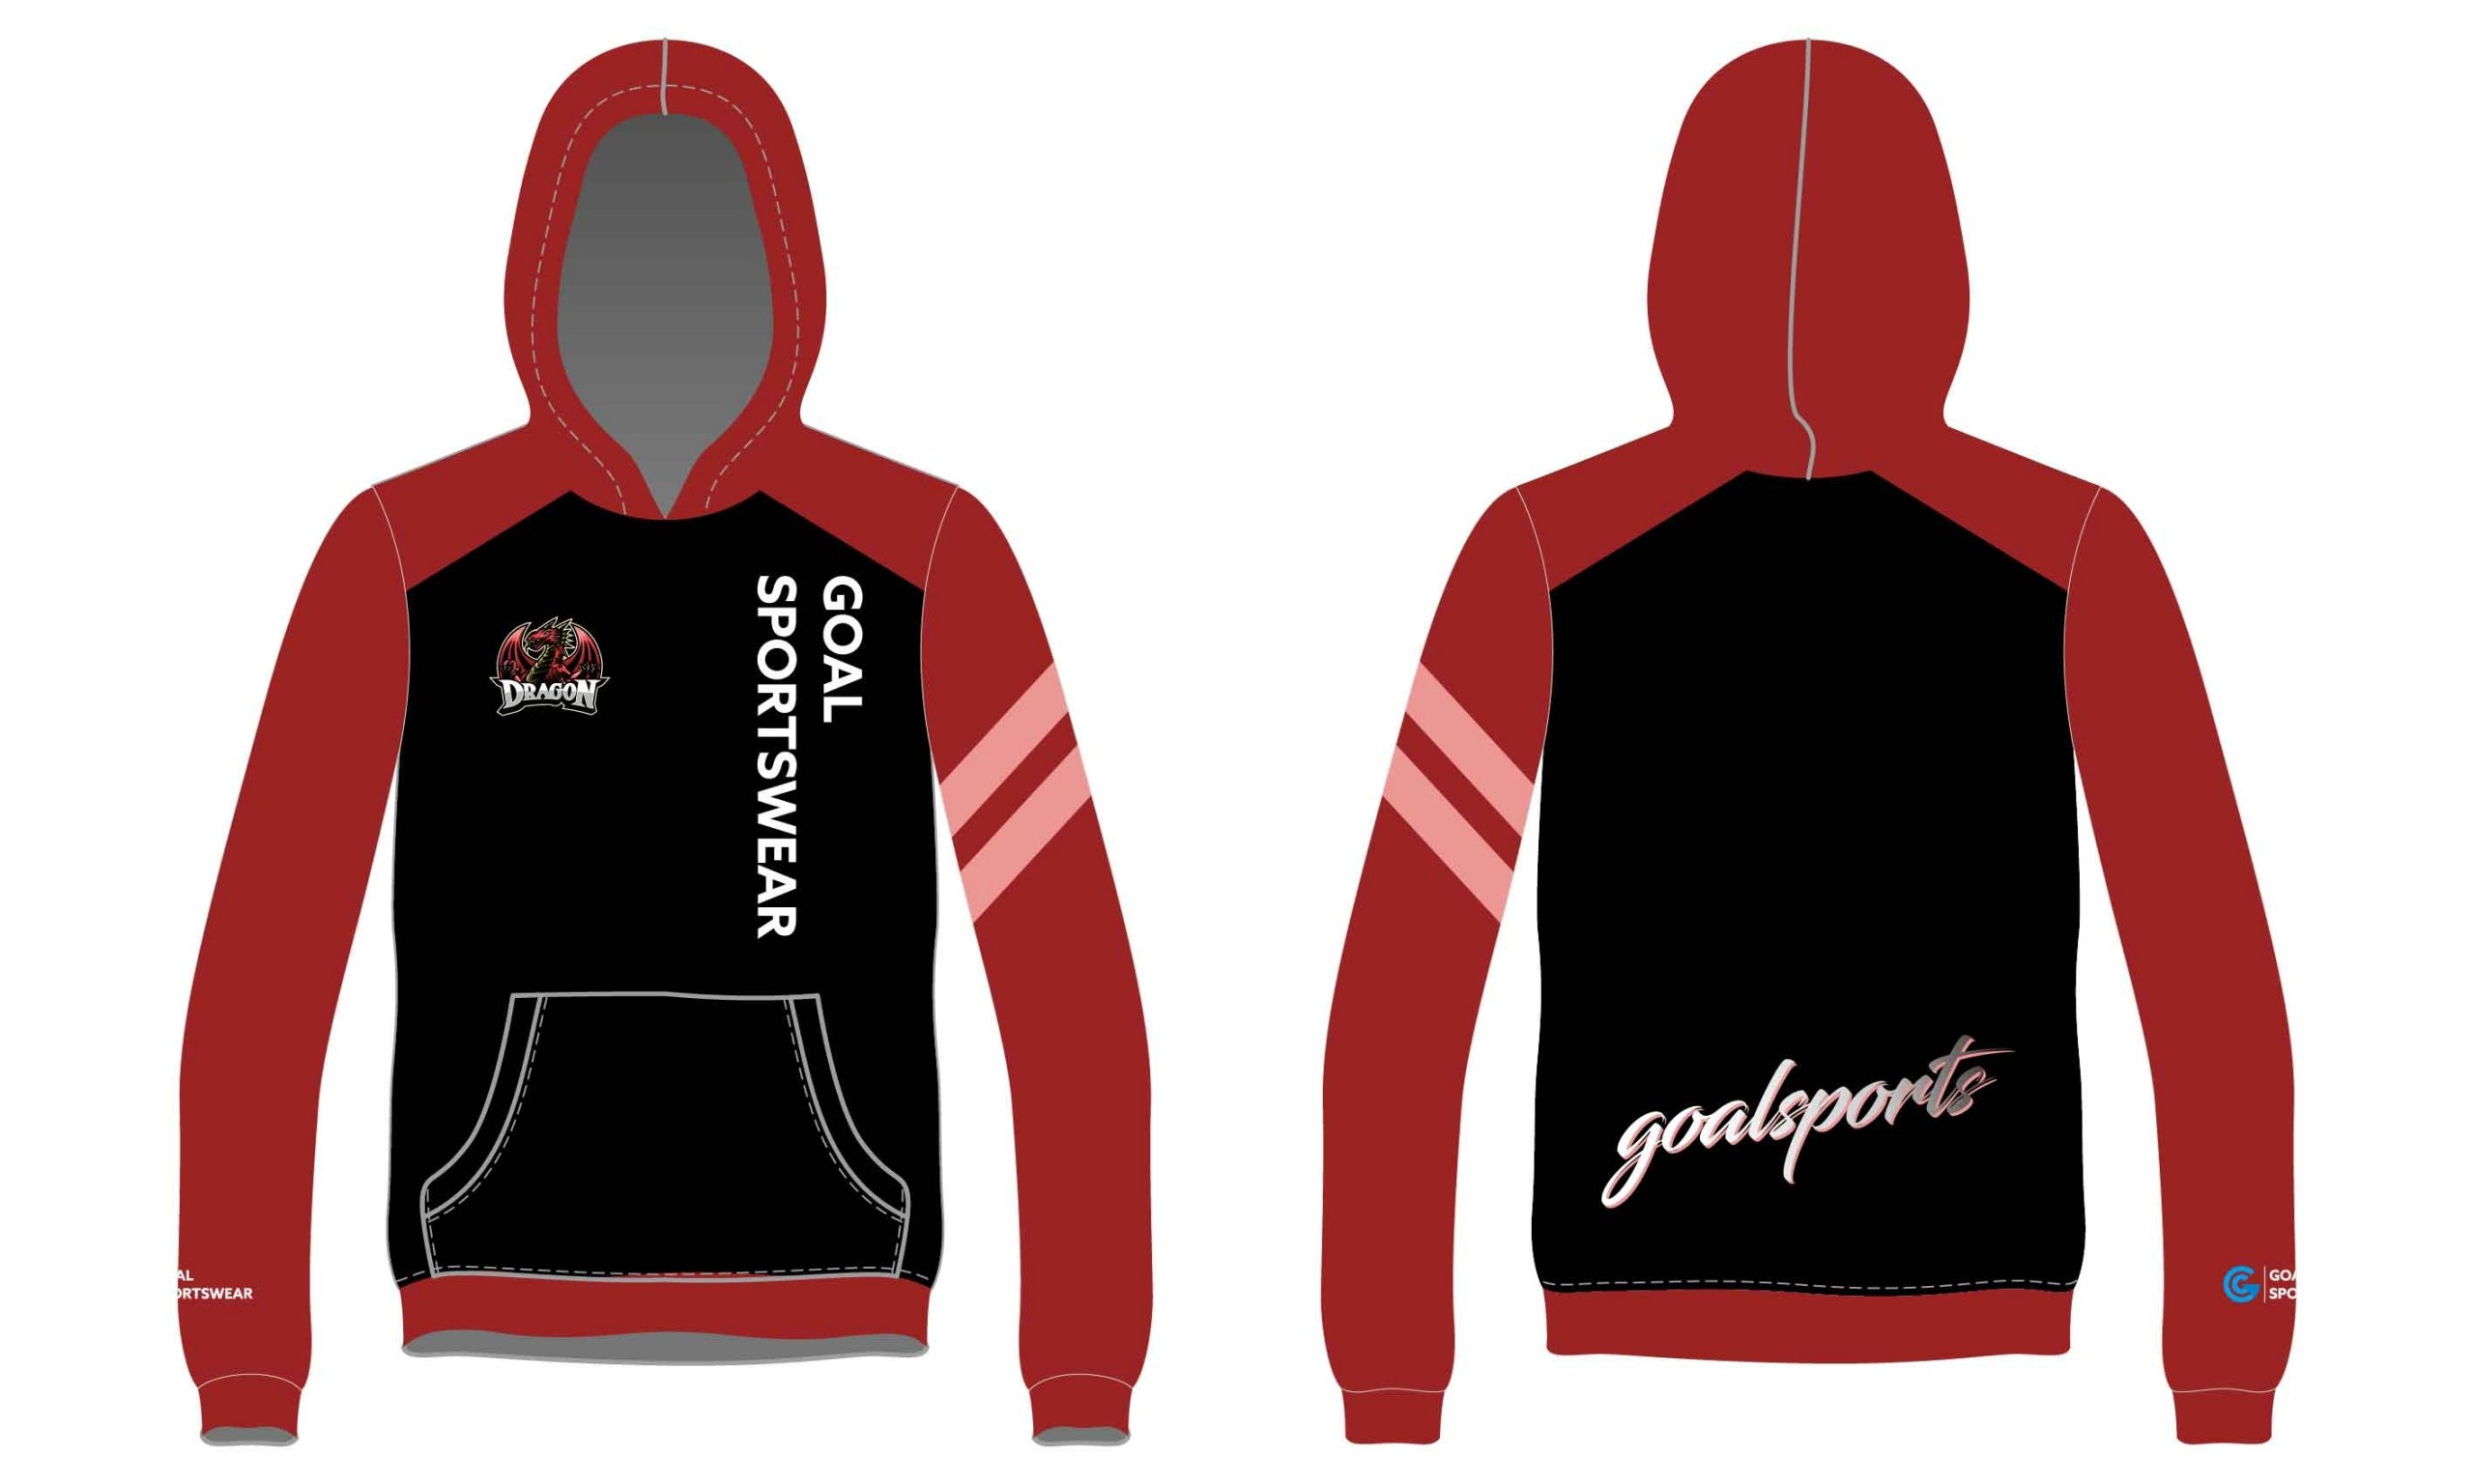 wholesale high qualtiy mens custom made wrestling hoodies